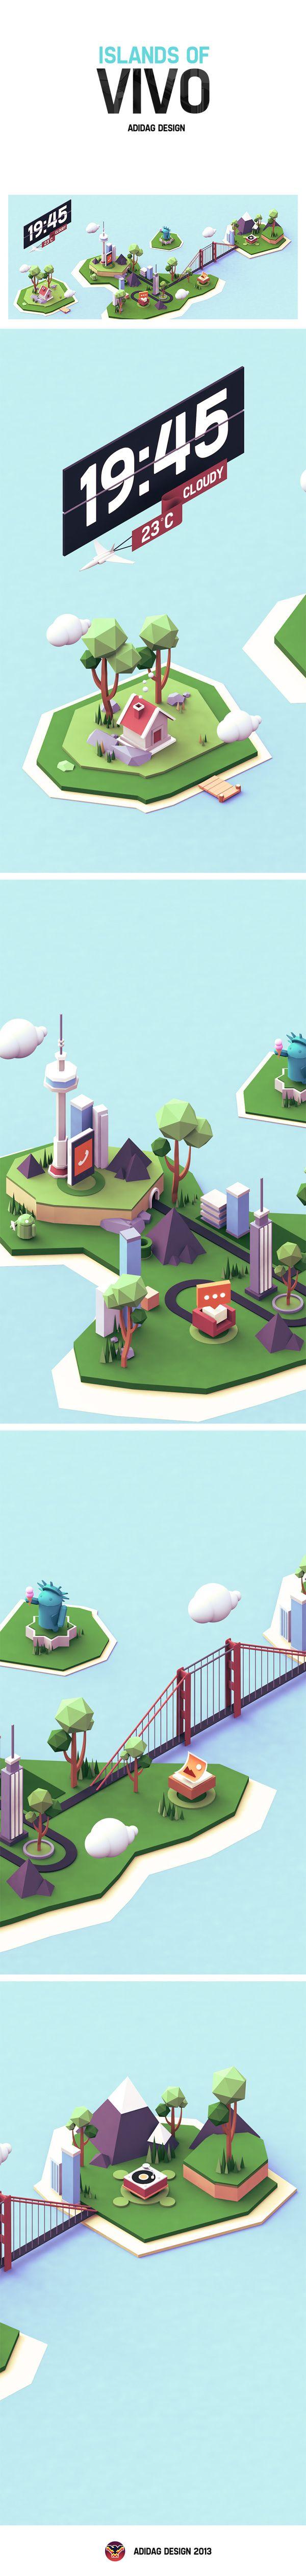 Islands of VIVO by Liu Yuantao -ADIDAG, via Behance